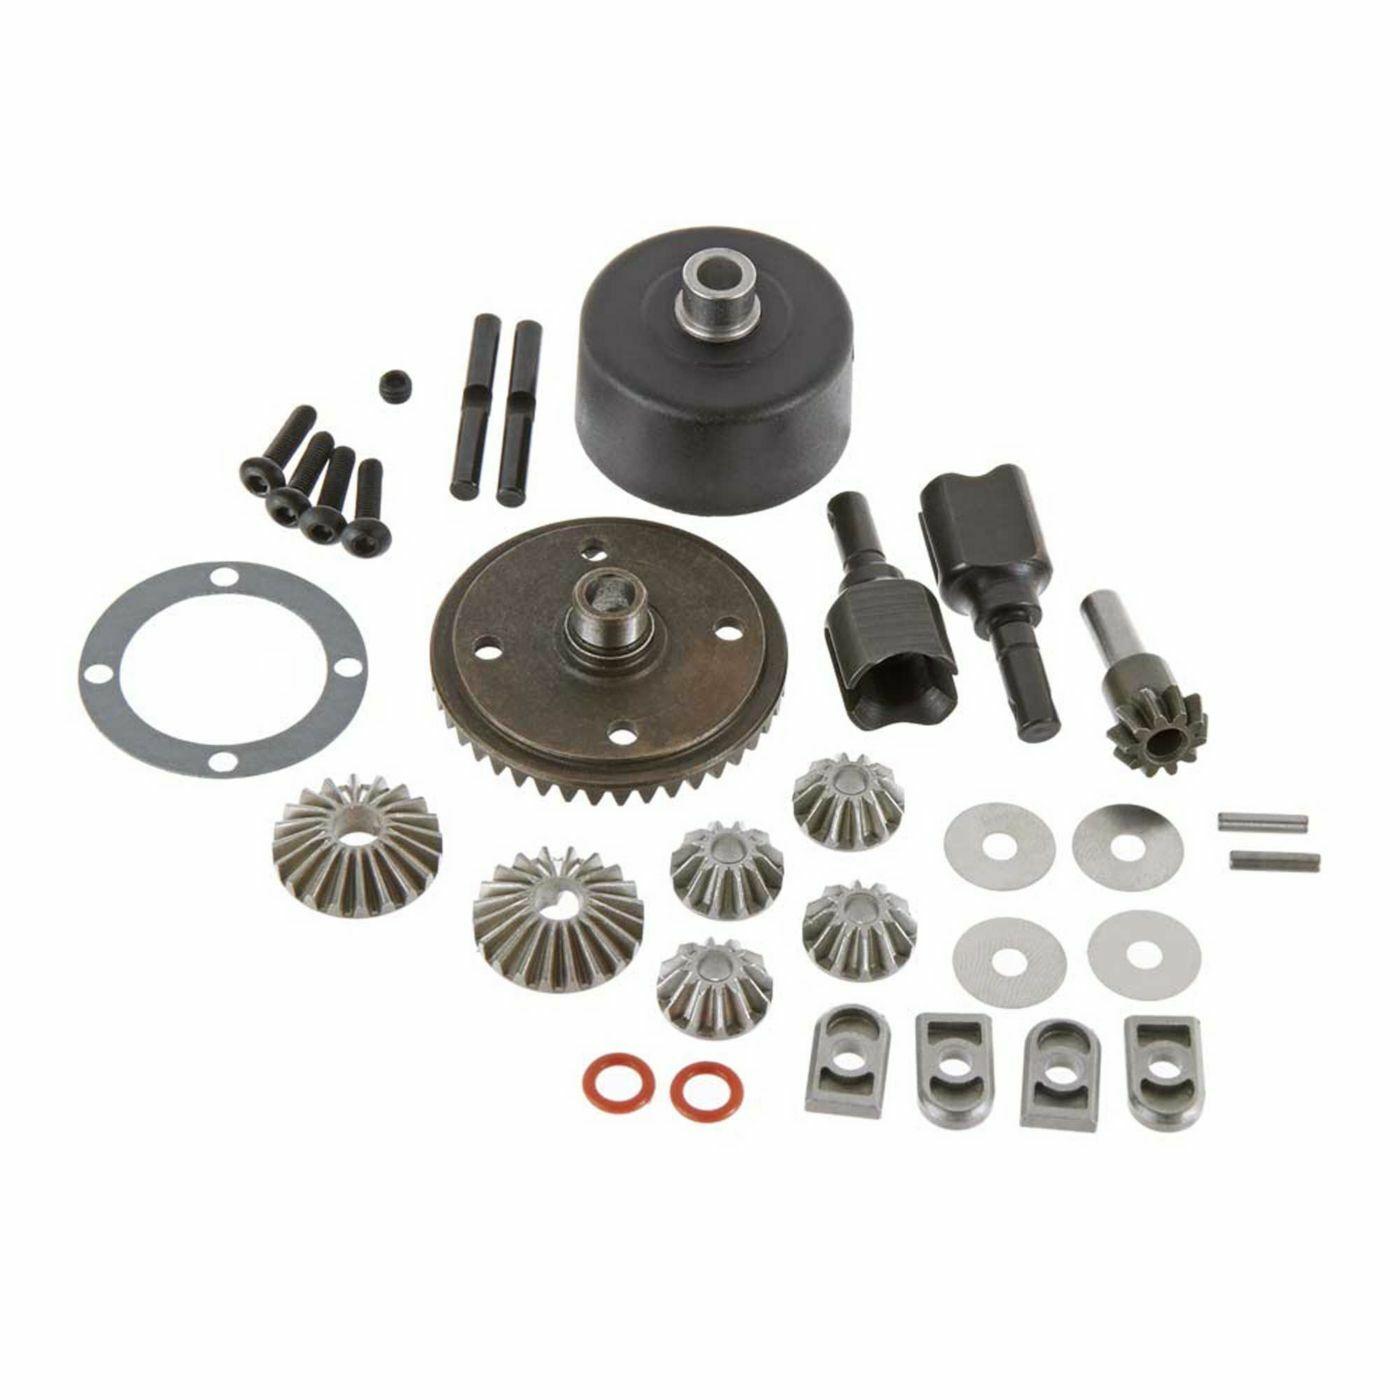 Arrma Kraton EXB 6s Rear Open Differential Diff Spiral Ring /& Pinion GP4 Gears